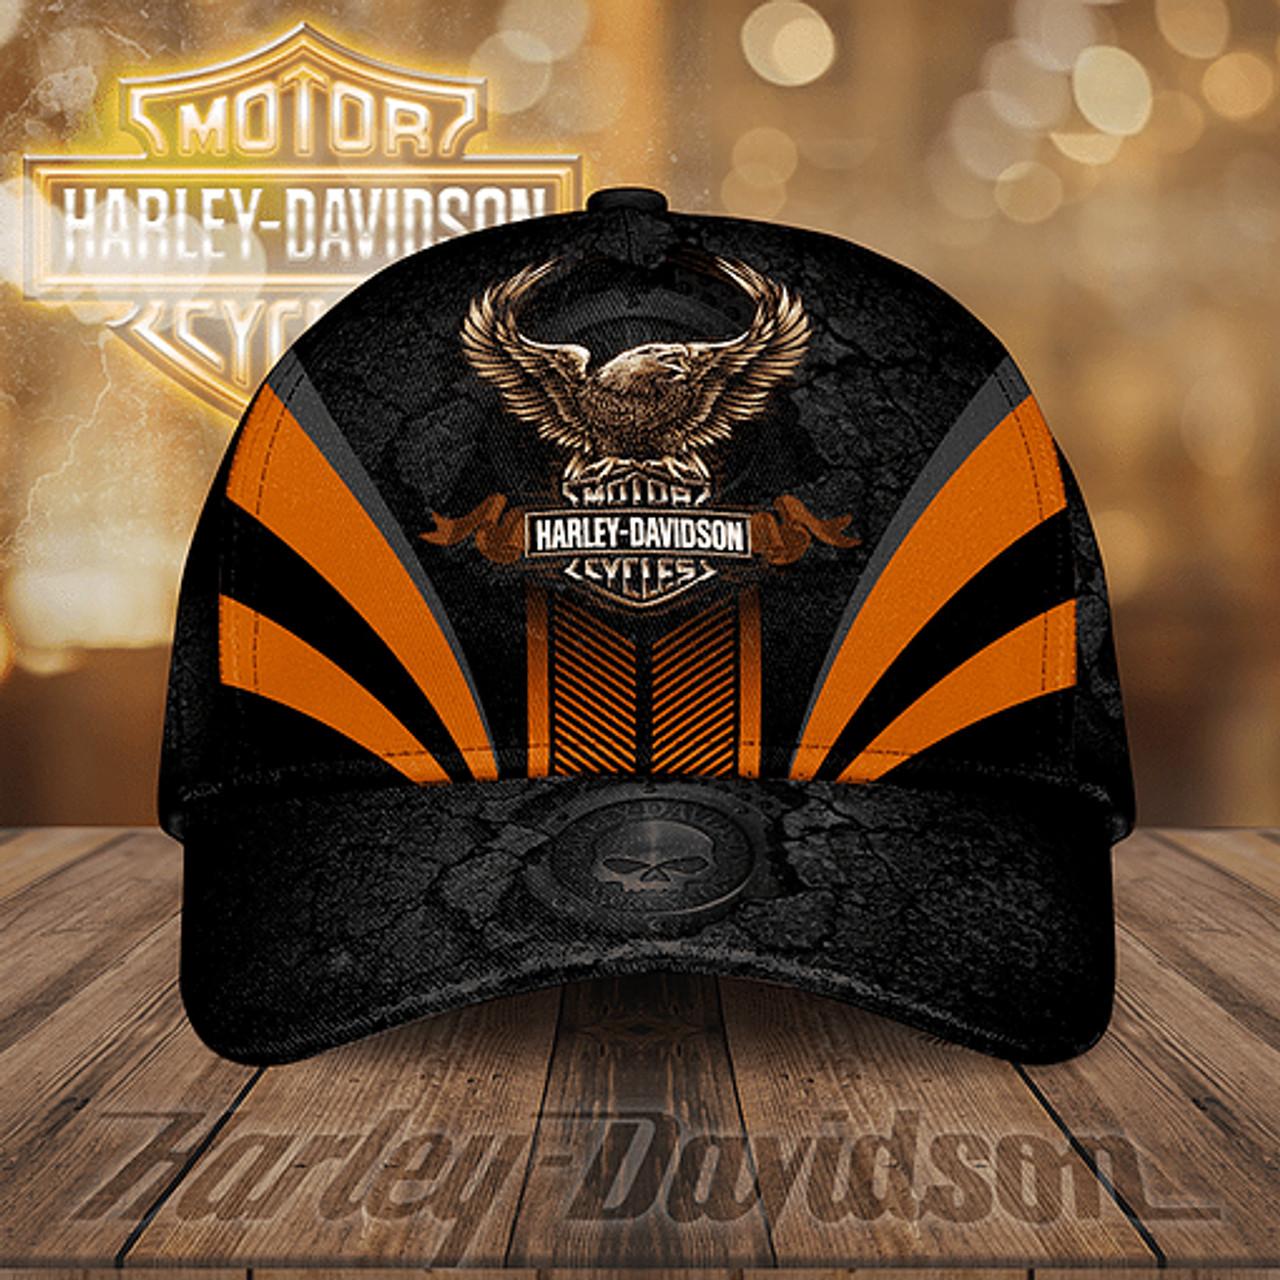 **(OFFICIAL-HARLEY-DAVIDSON-MOTORCYCLE-BIKER-HATS/CUSTOM-GRAPHIC-3D-PRINTED-HARLEY-EAGLE-DESIGN)**